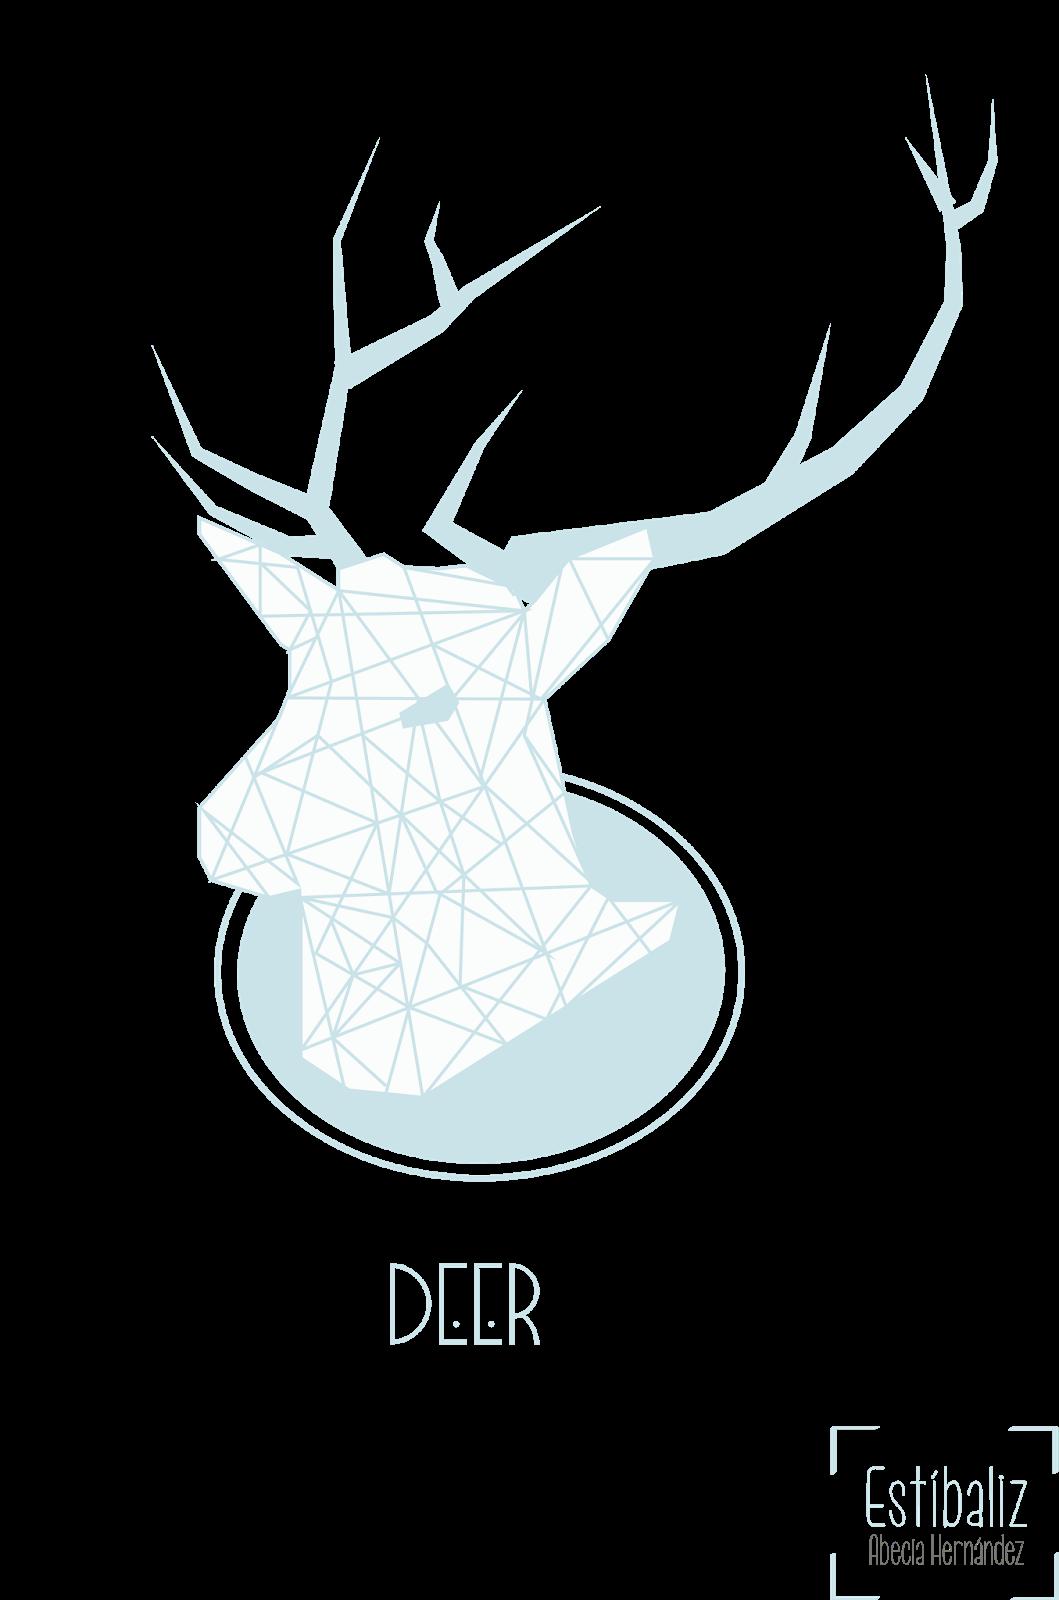 Heartbeat clipart deer. Illustration graphic design pinterest